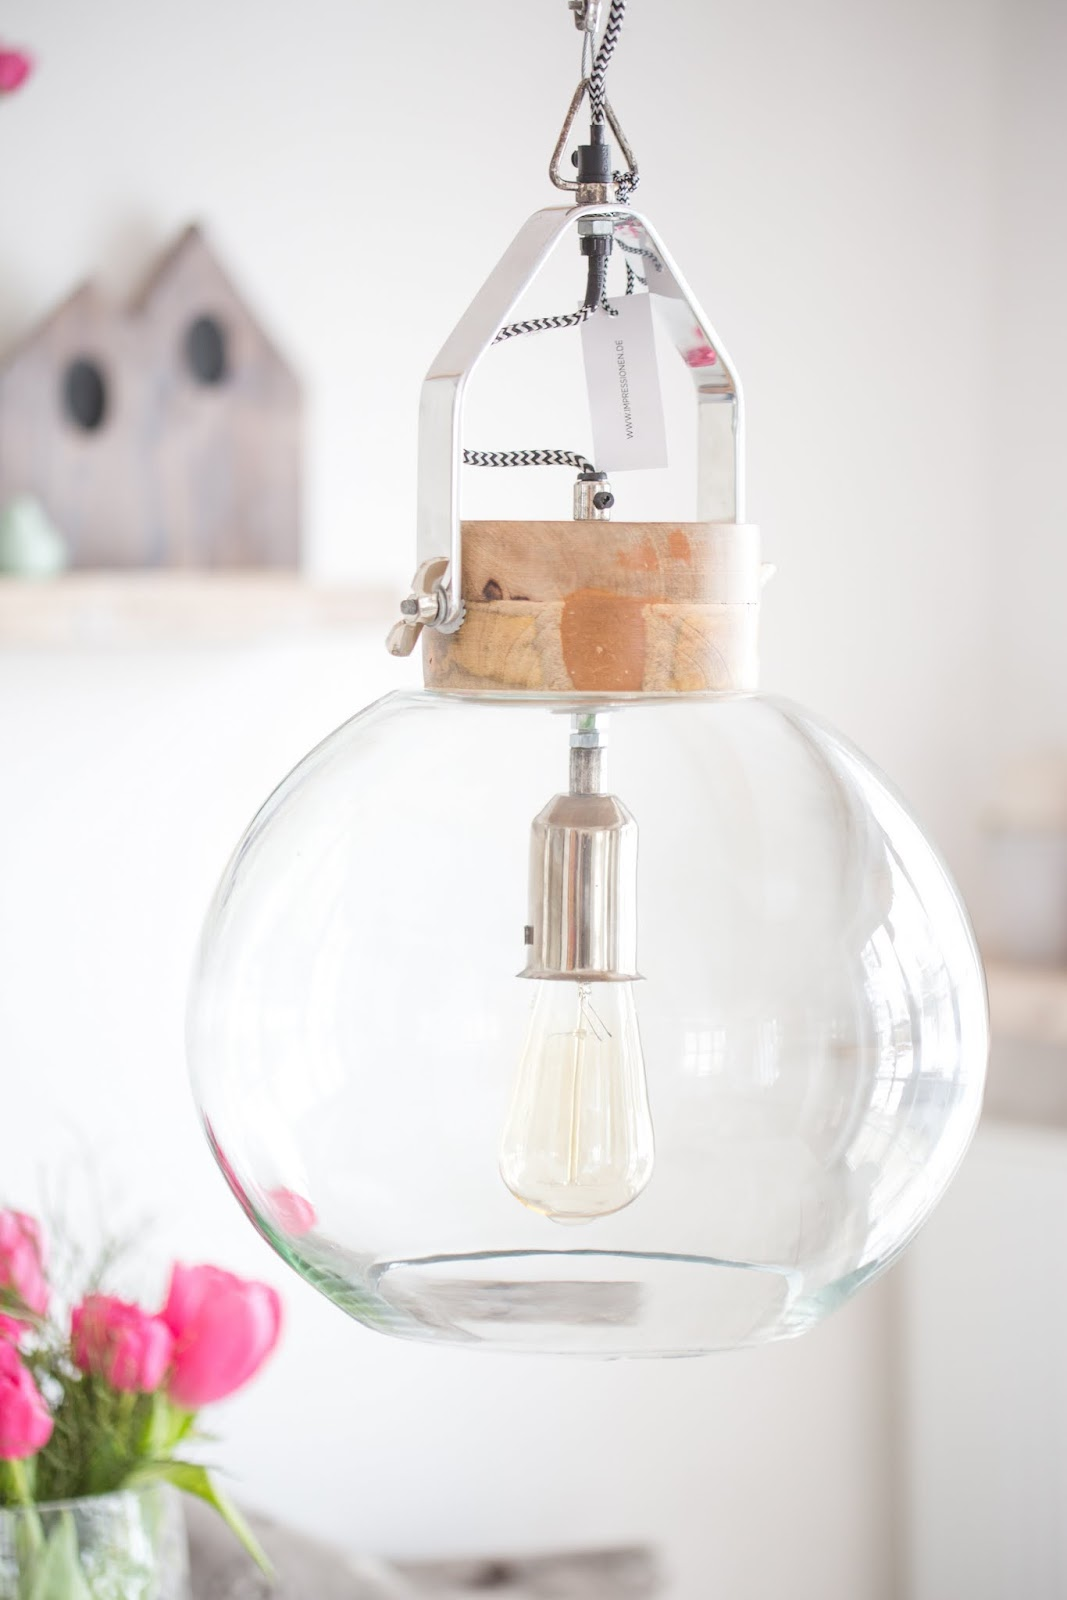 pinke lampe trendy se biene with pinke lampe cheap ikea with pinke lampe simple lampe berger. Black Bedroom Furniture Sets. Home Design Ideas